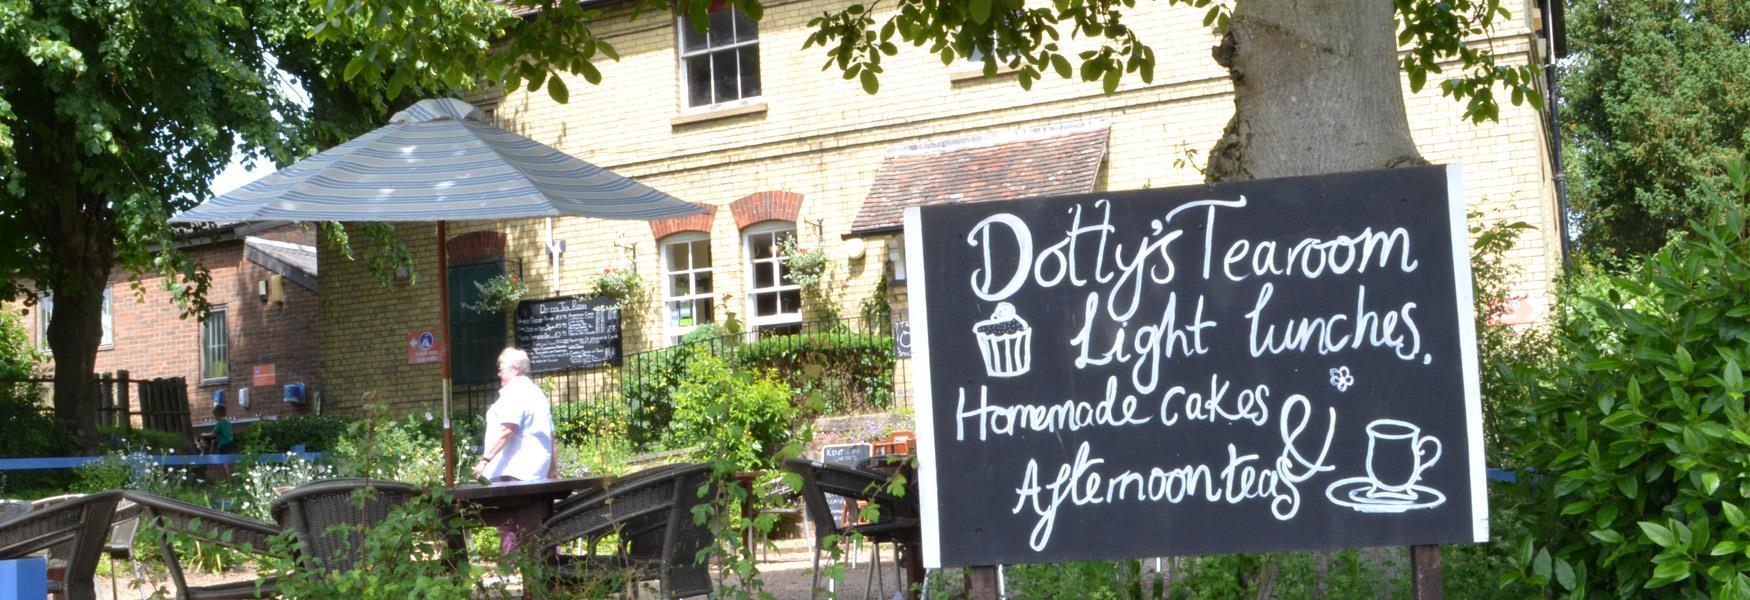 Dotty's Tea Room at Kent Life